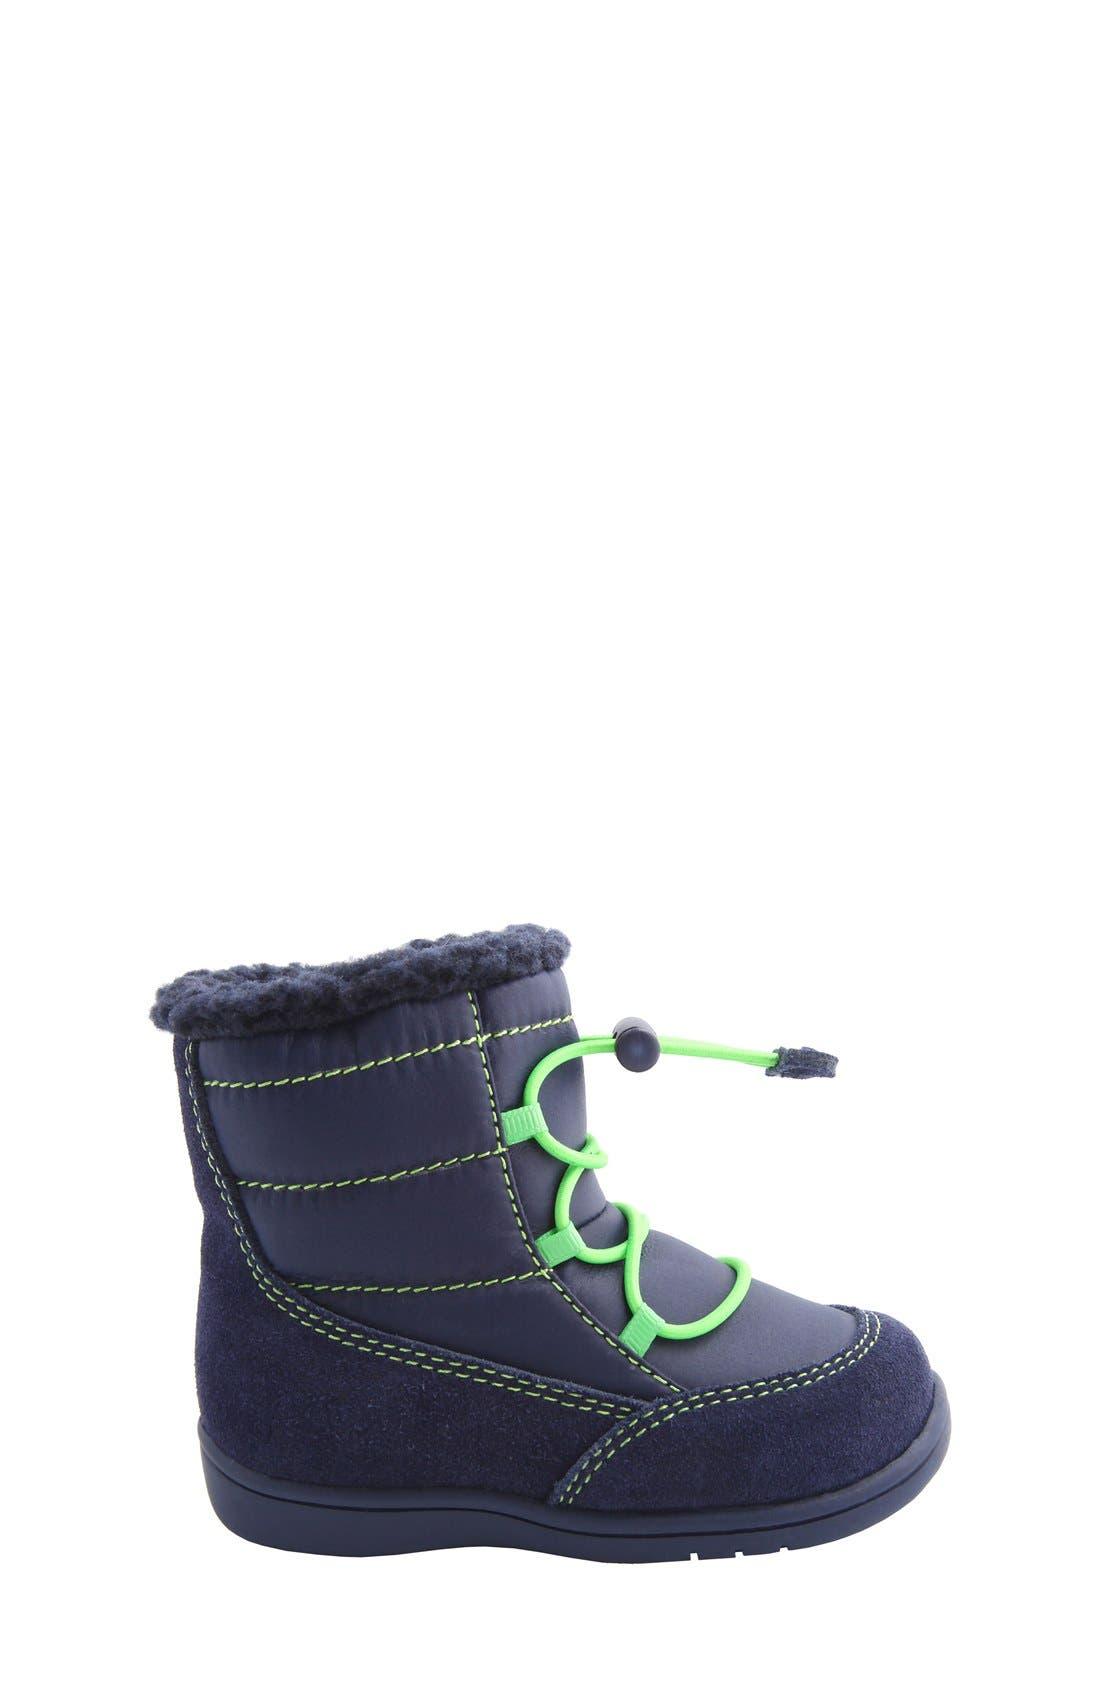 Nina 'Yolie' Lace-Up Boot,                             Alternate thumbnail 18, color,